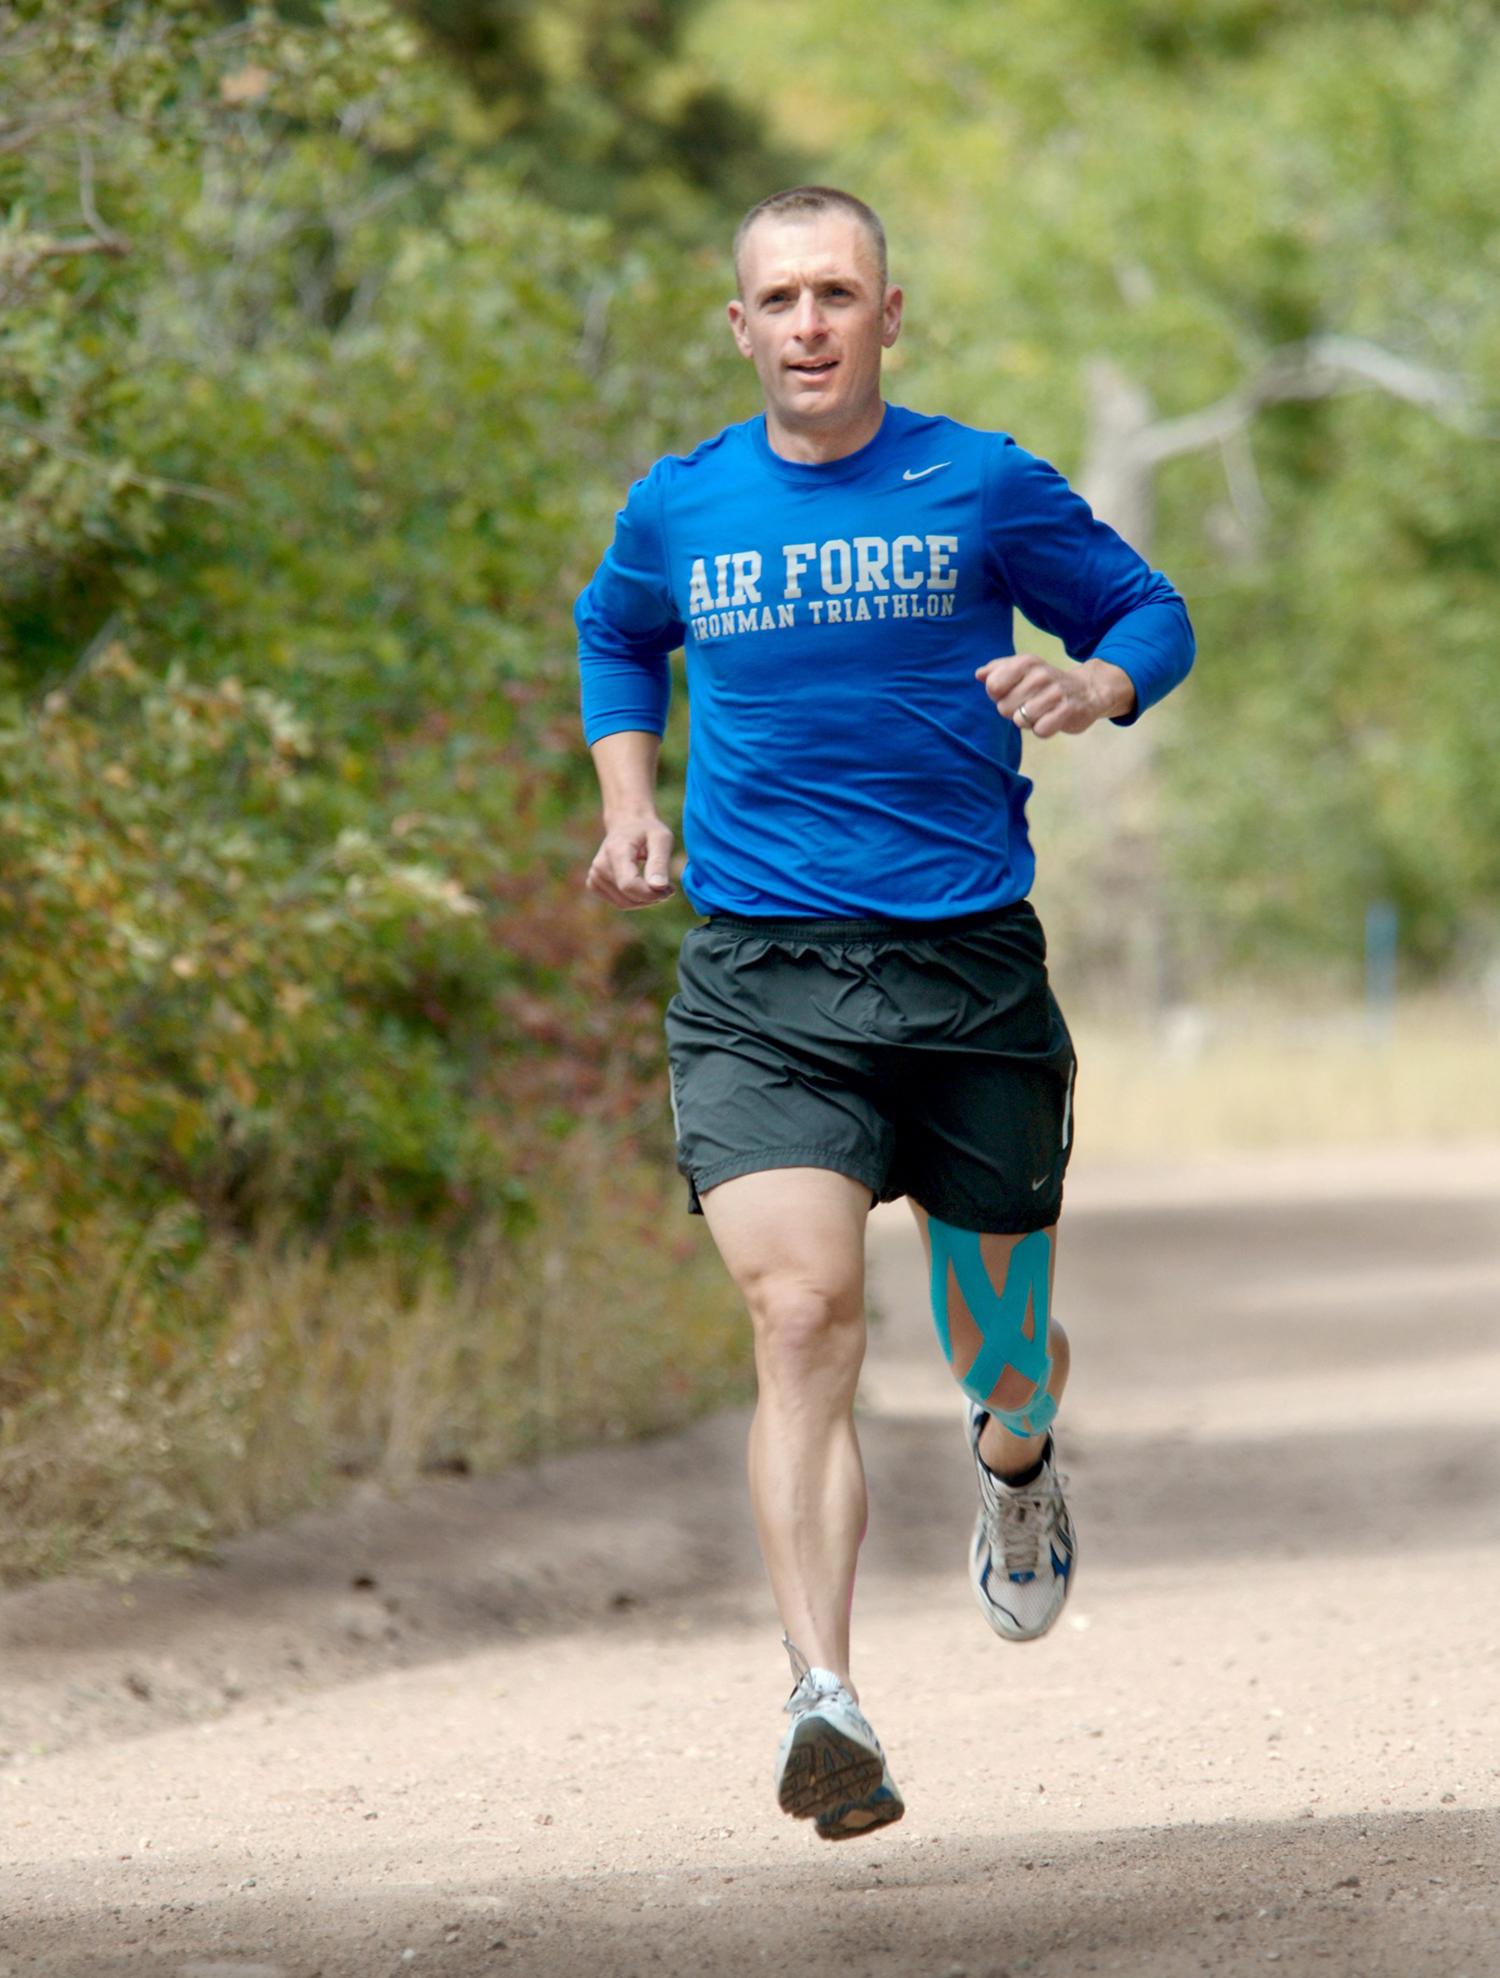 Runner Training In The Forest